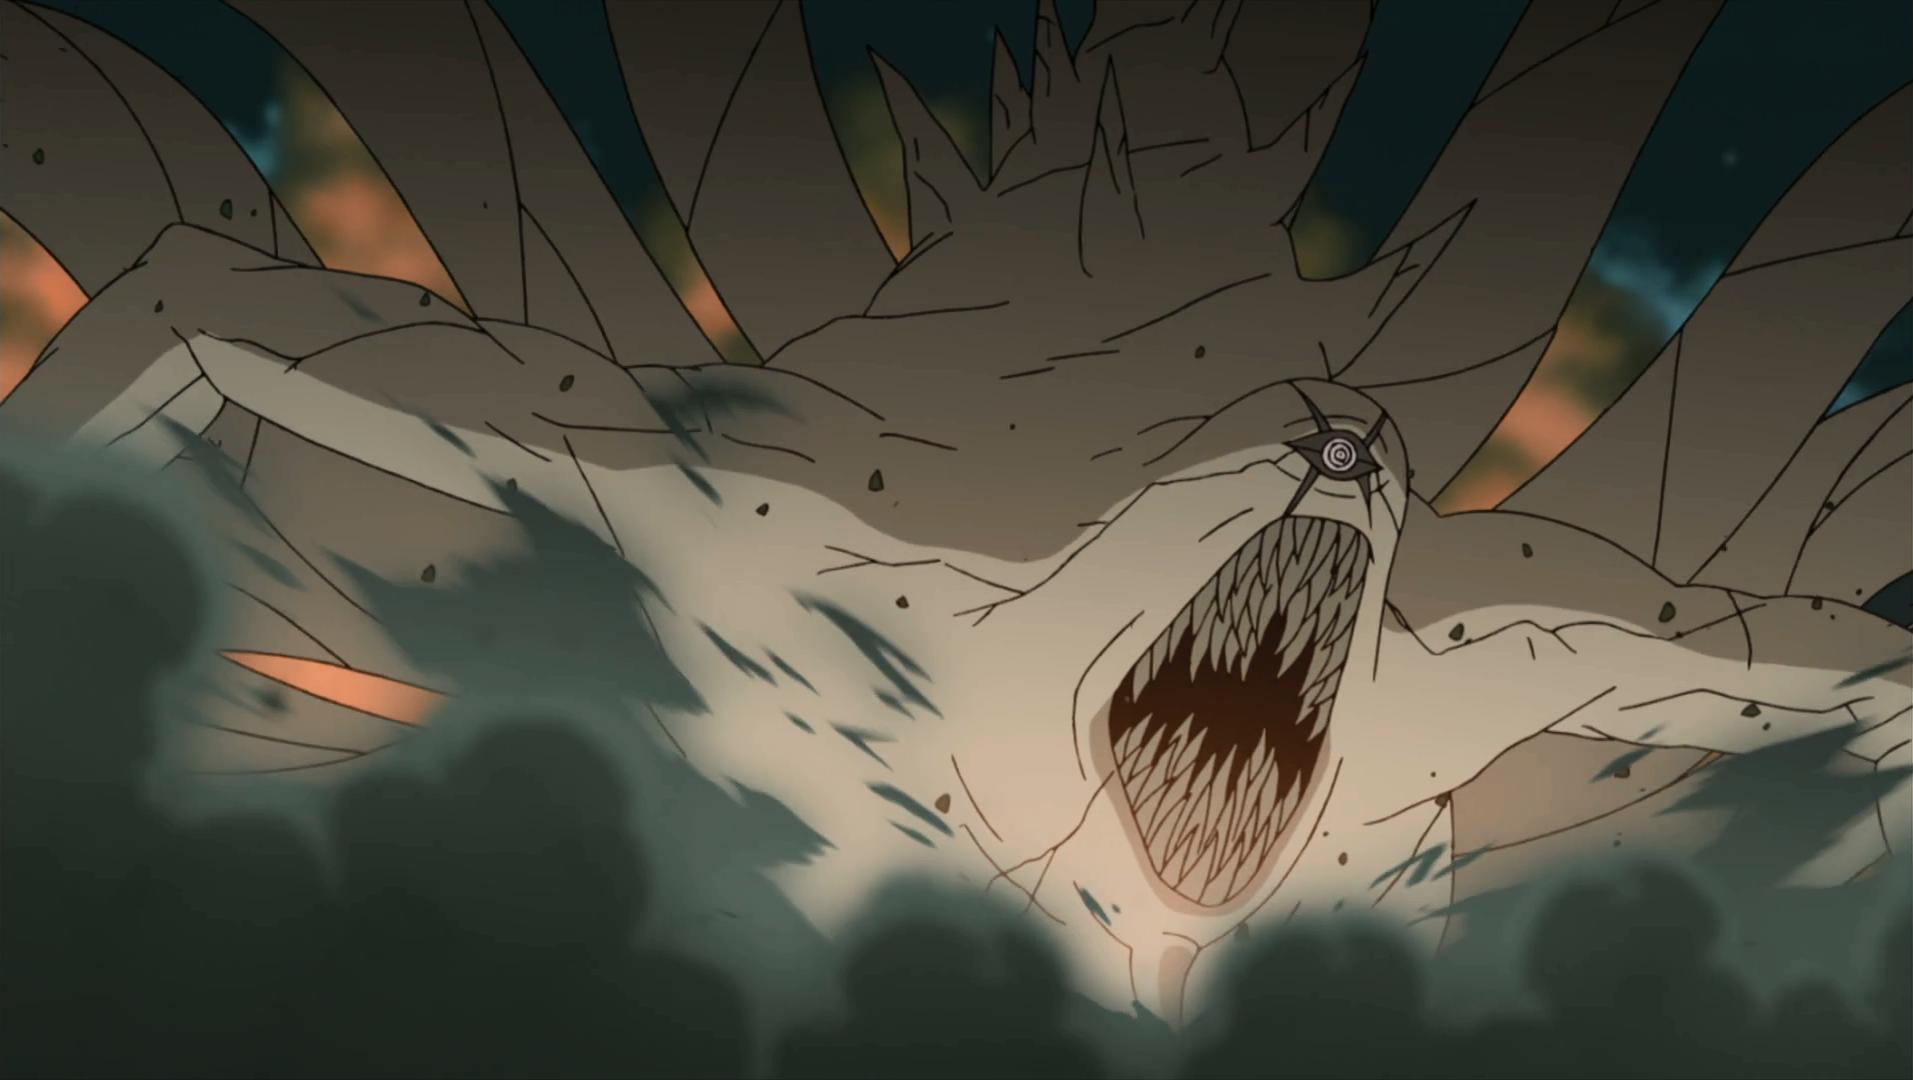 Ten Tails Narutopedia Fandom Powered By Wikia Tailed Beasts Naruto Naruto Naruto Drawings